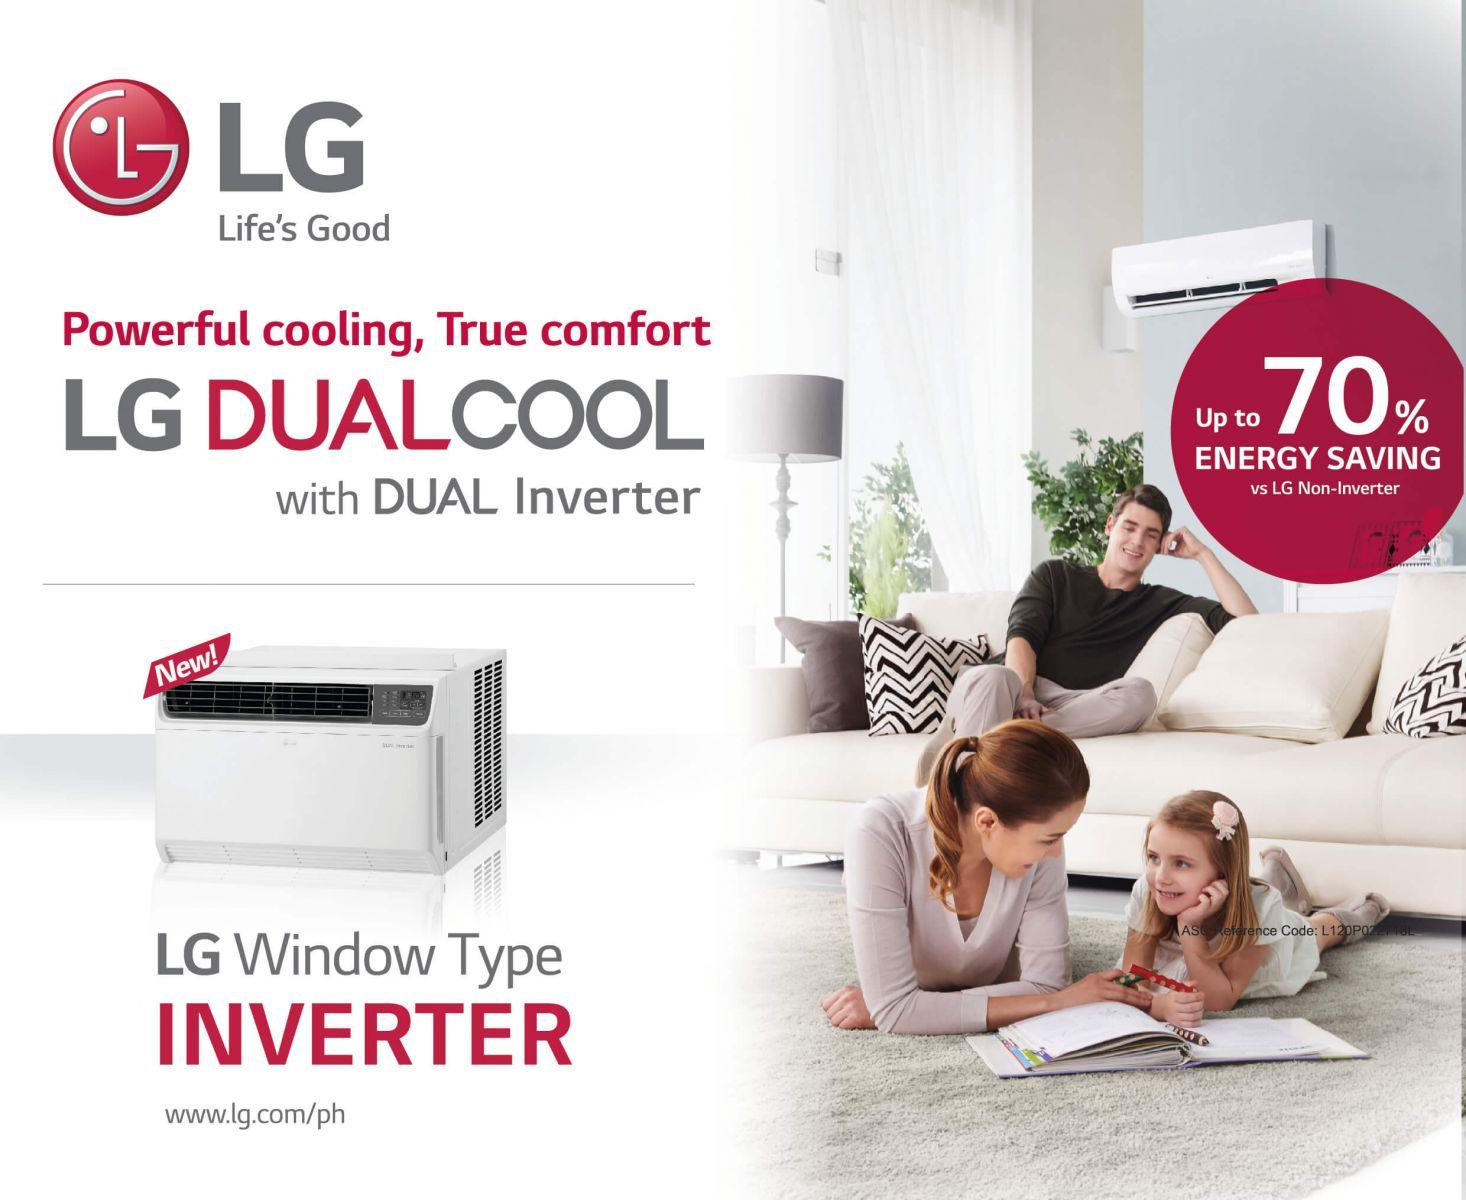 lg-dualcool-inverter